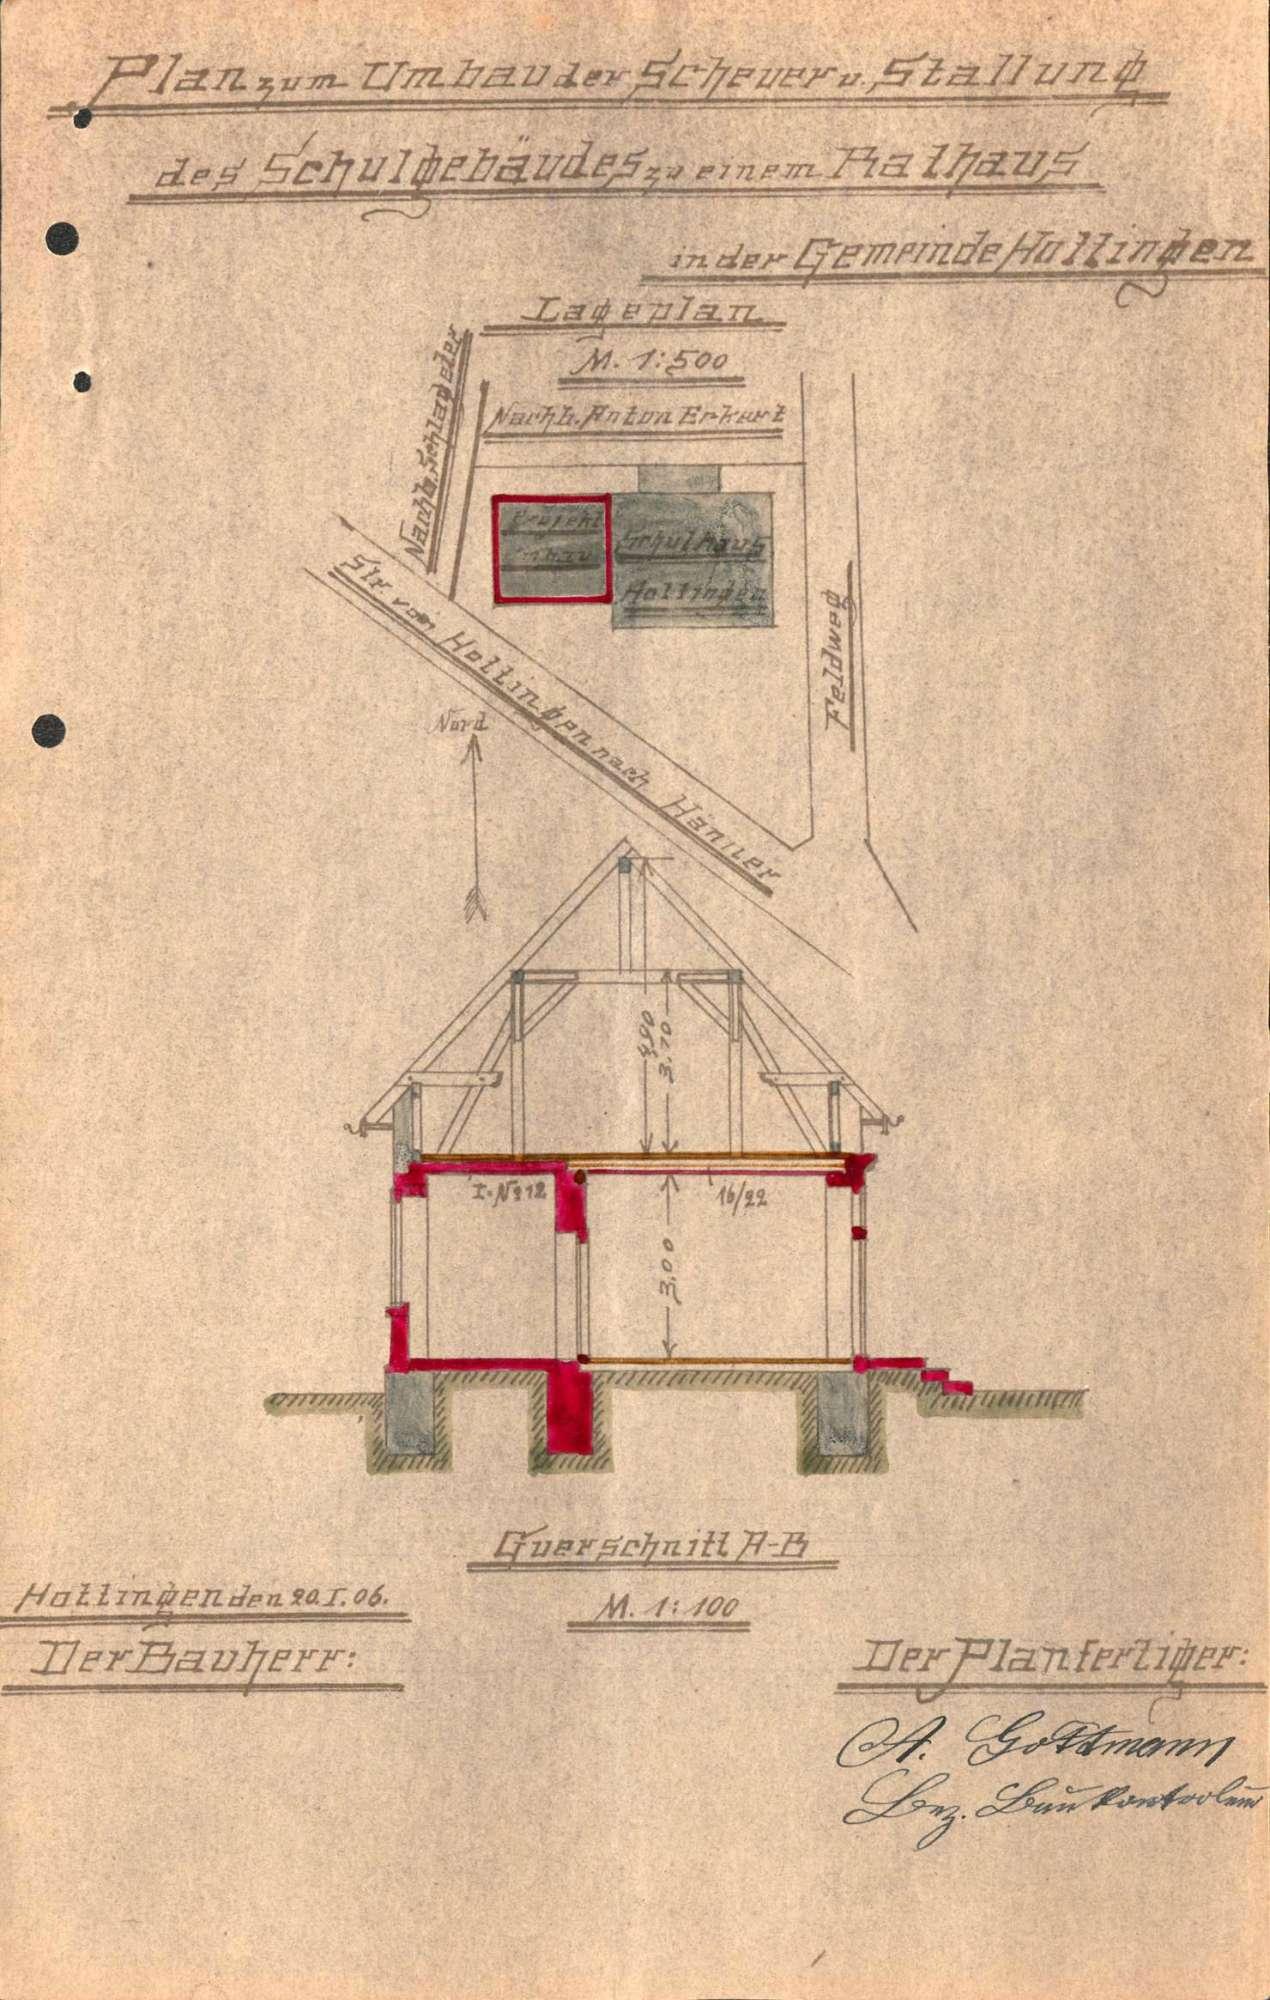 Umbau des Rathauses der Gemeinde Hottingen, Bild 1